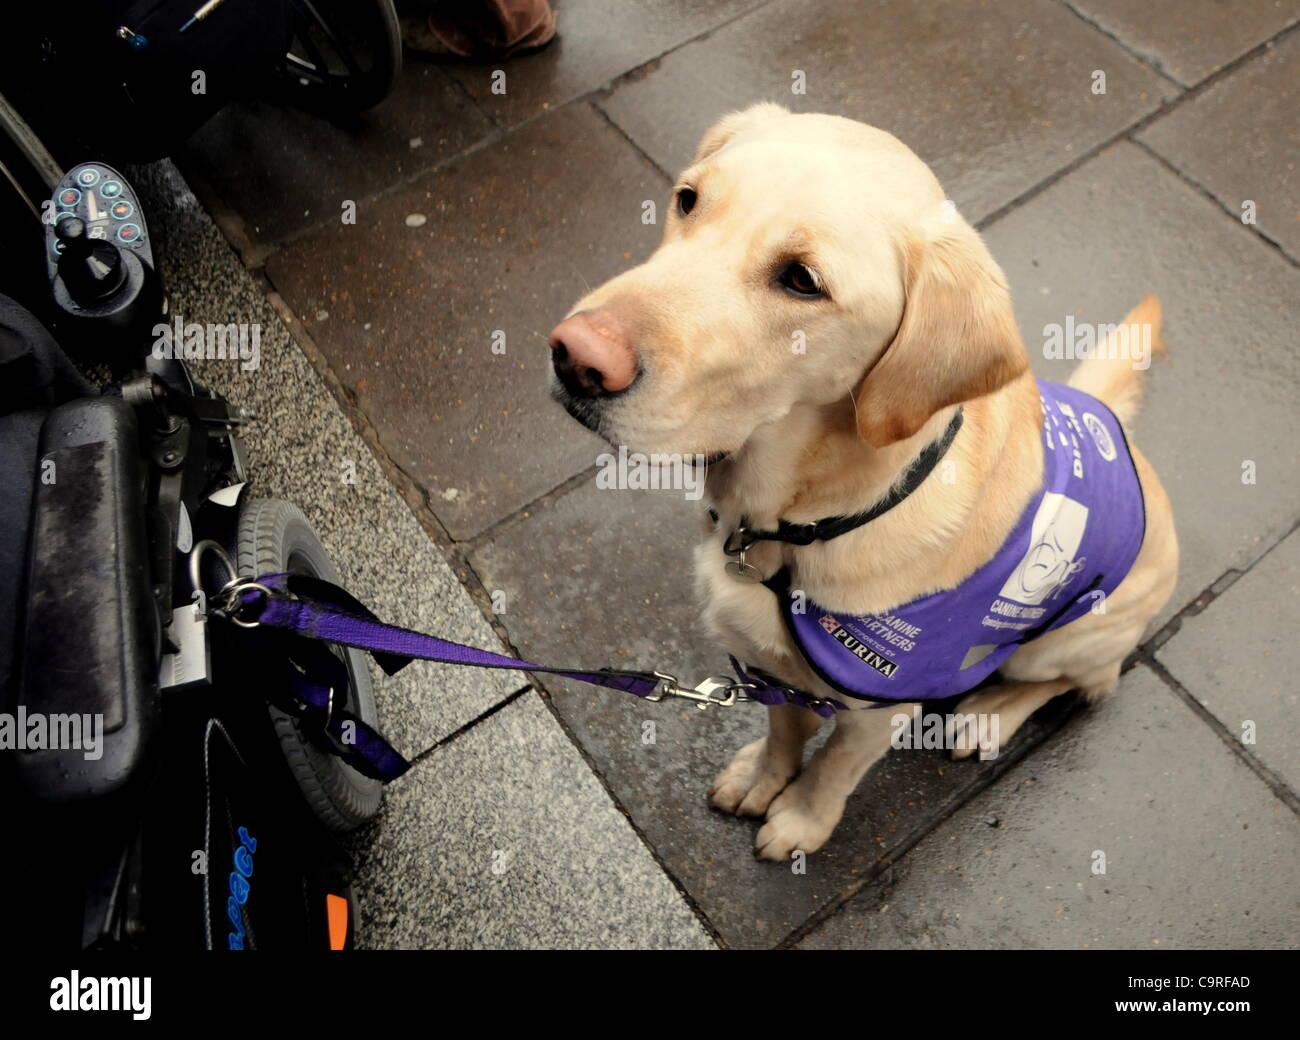 London Uk 13 02 12 A Labrador Assistance Dog Wears An Anti Cuts